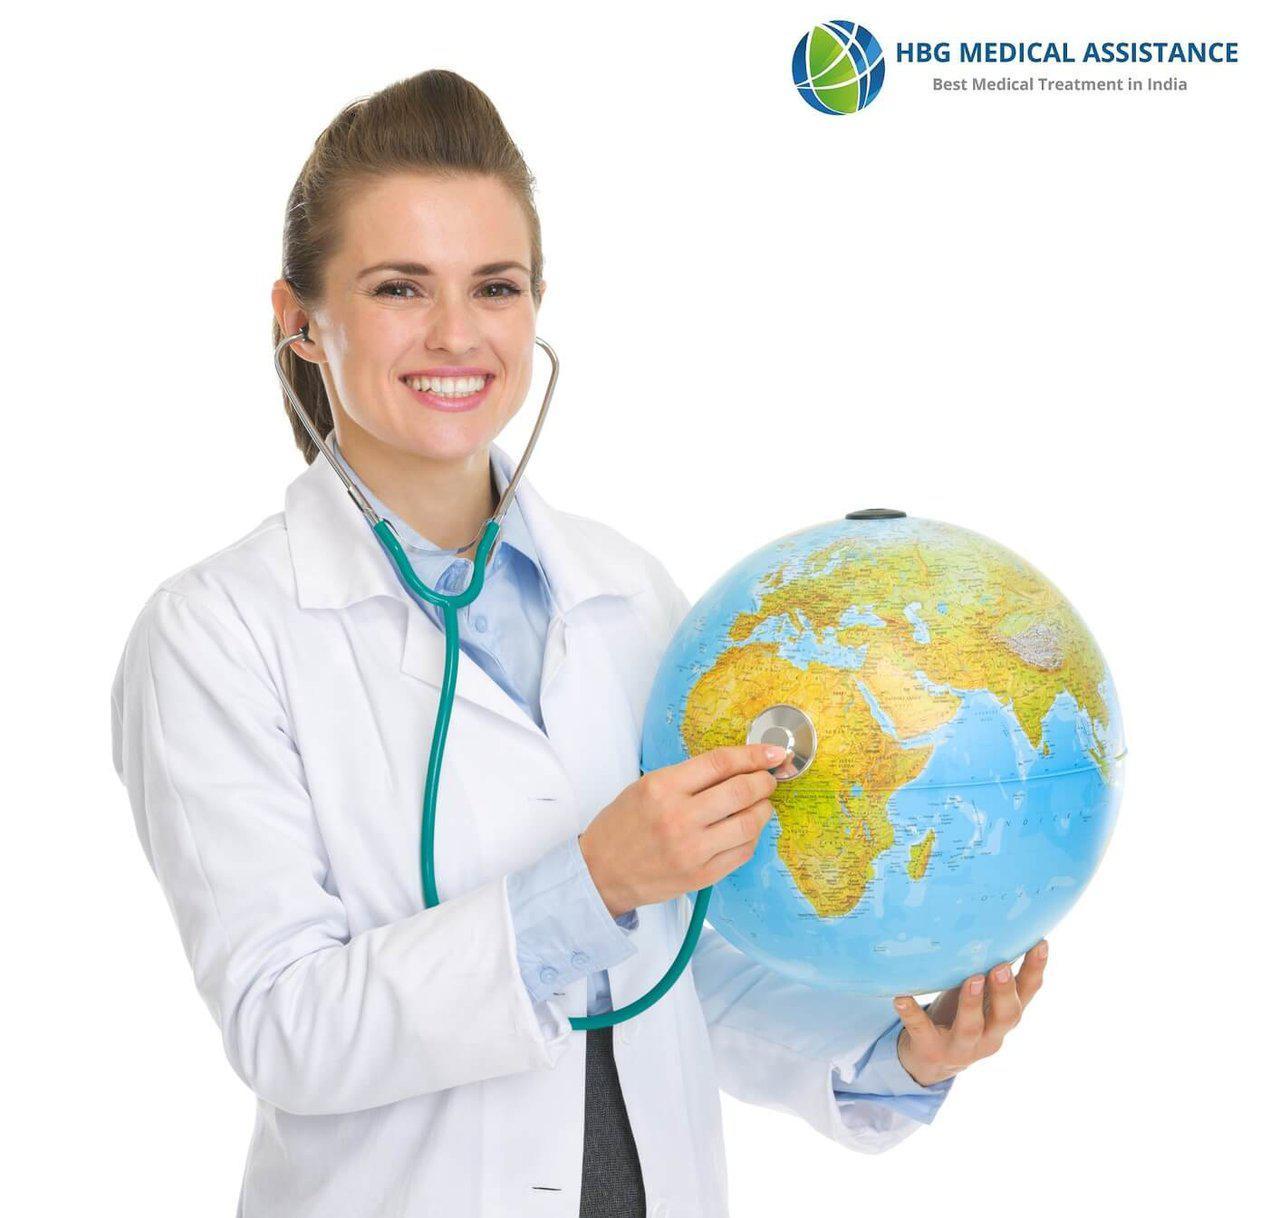 high-beam-global-medical-assistance